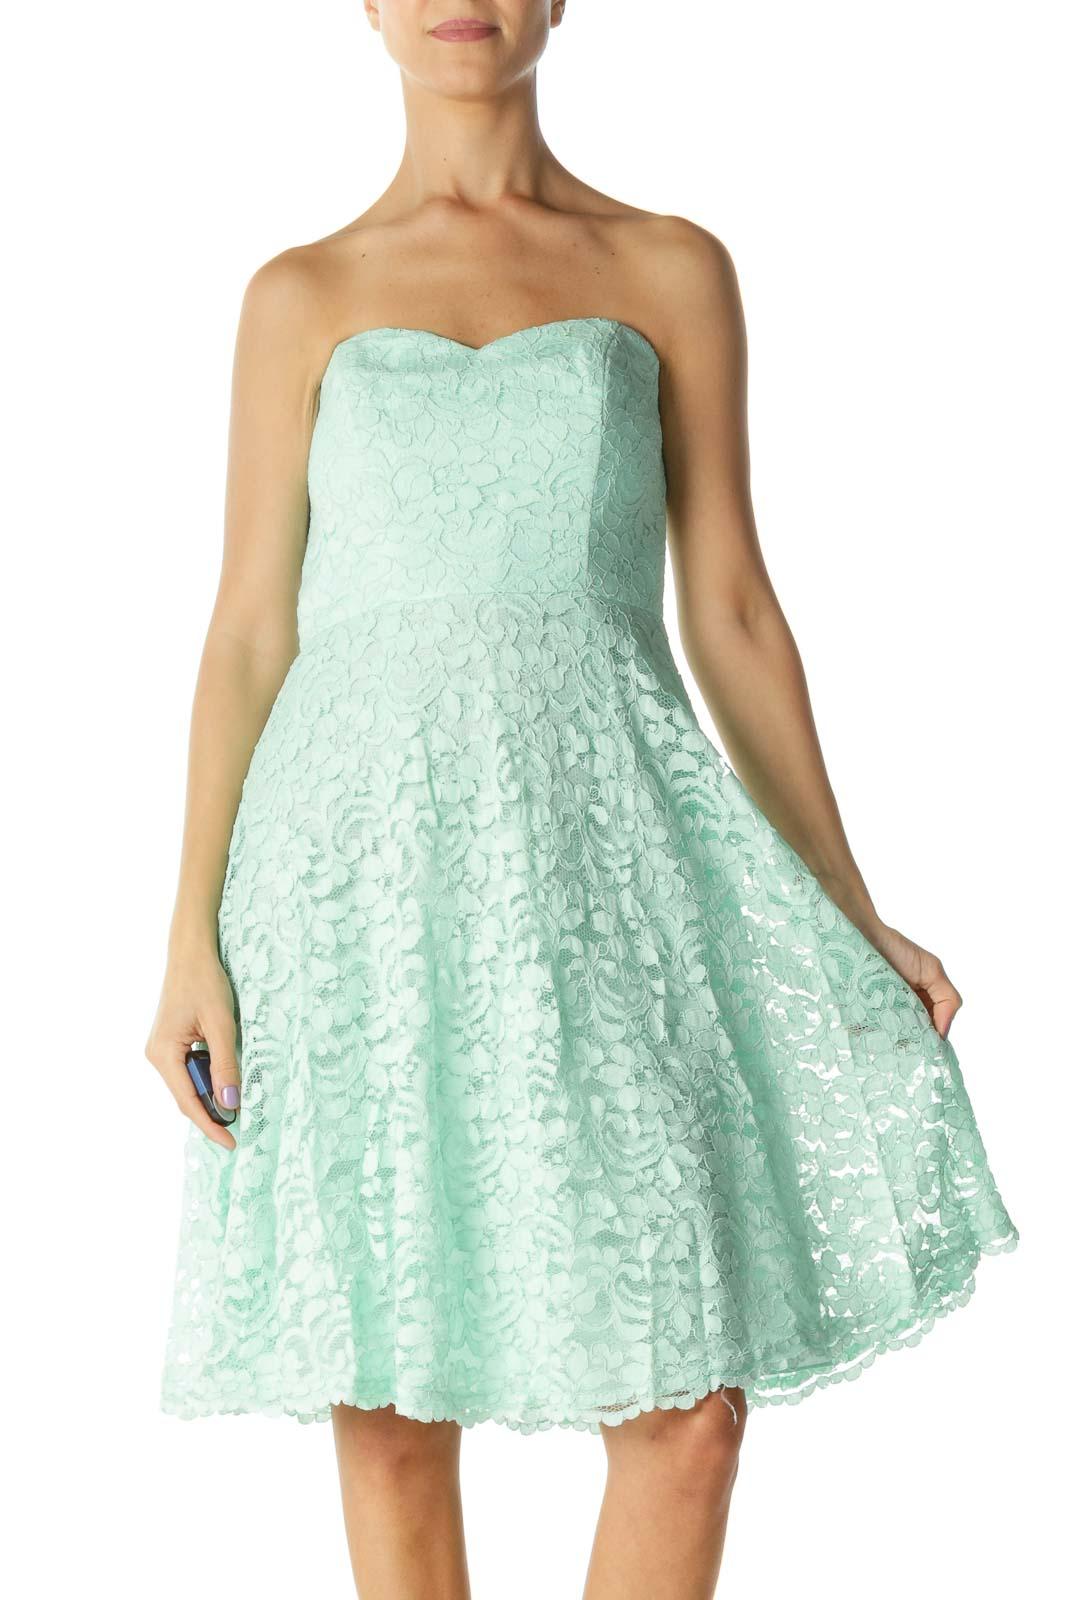 Mint Lace Floral Print Strapless Dress Front